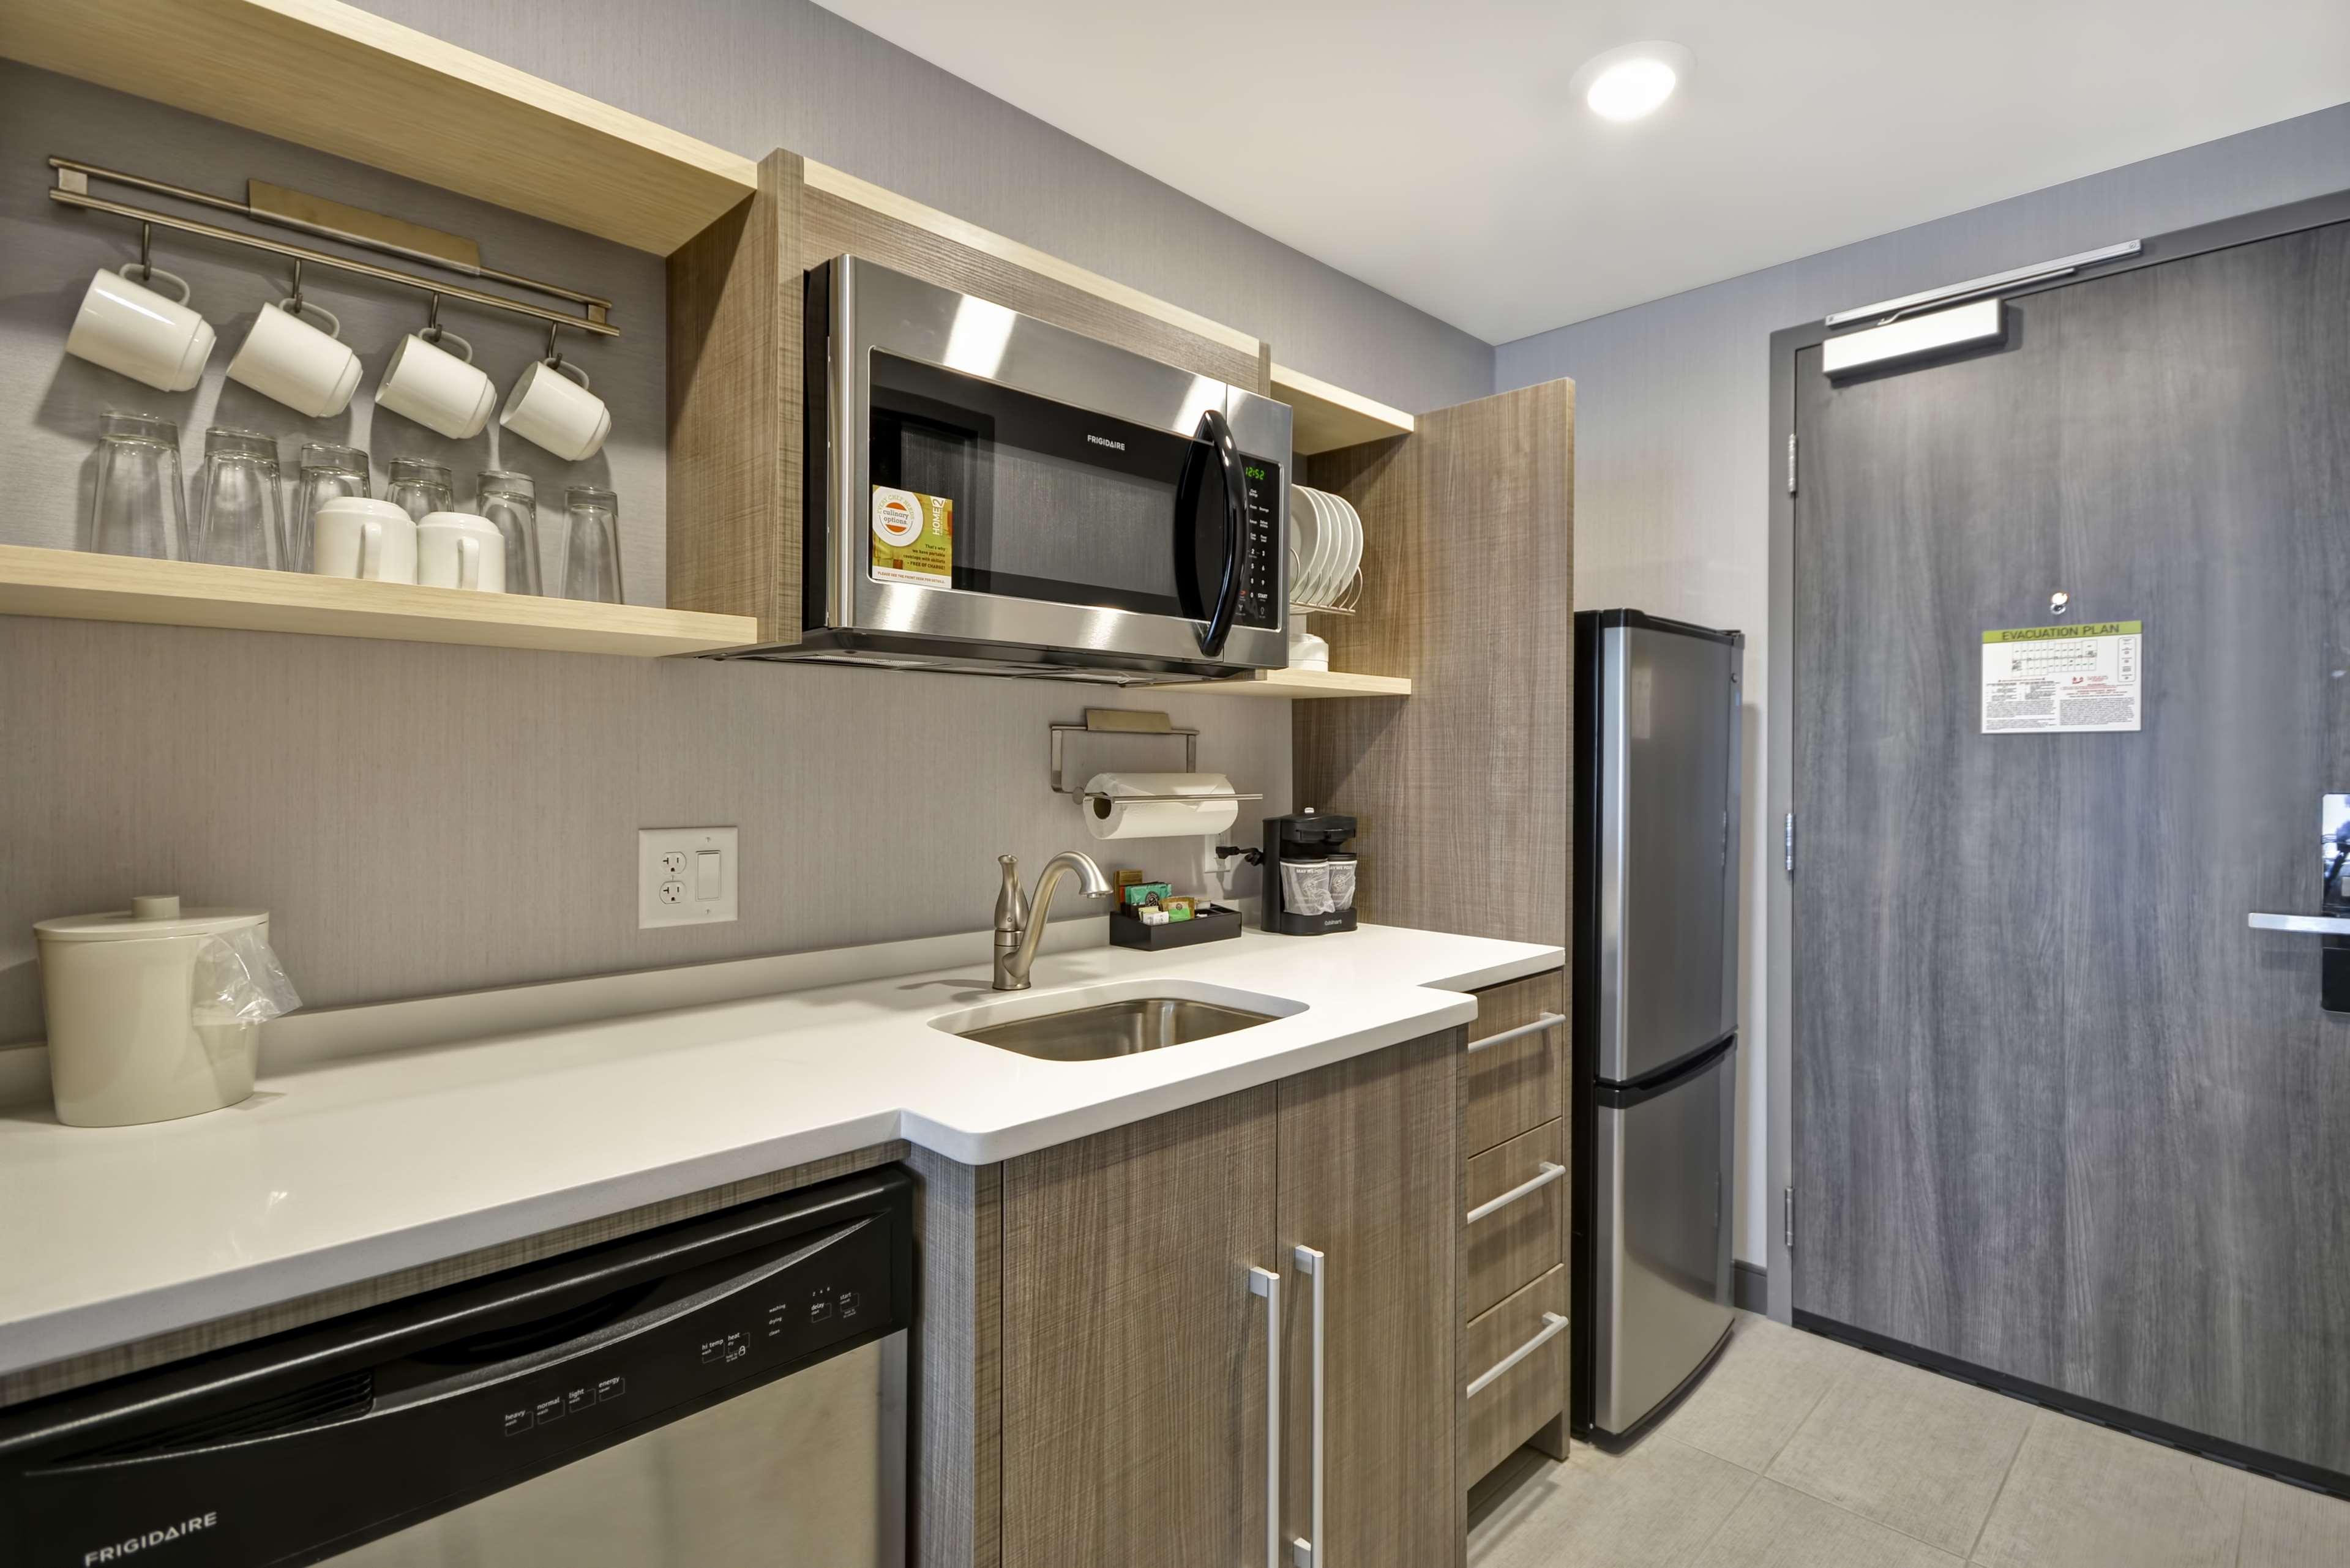 Home2 Suites by Hilton Atlanta West Lithia Springs image 35